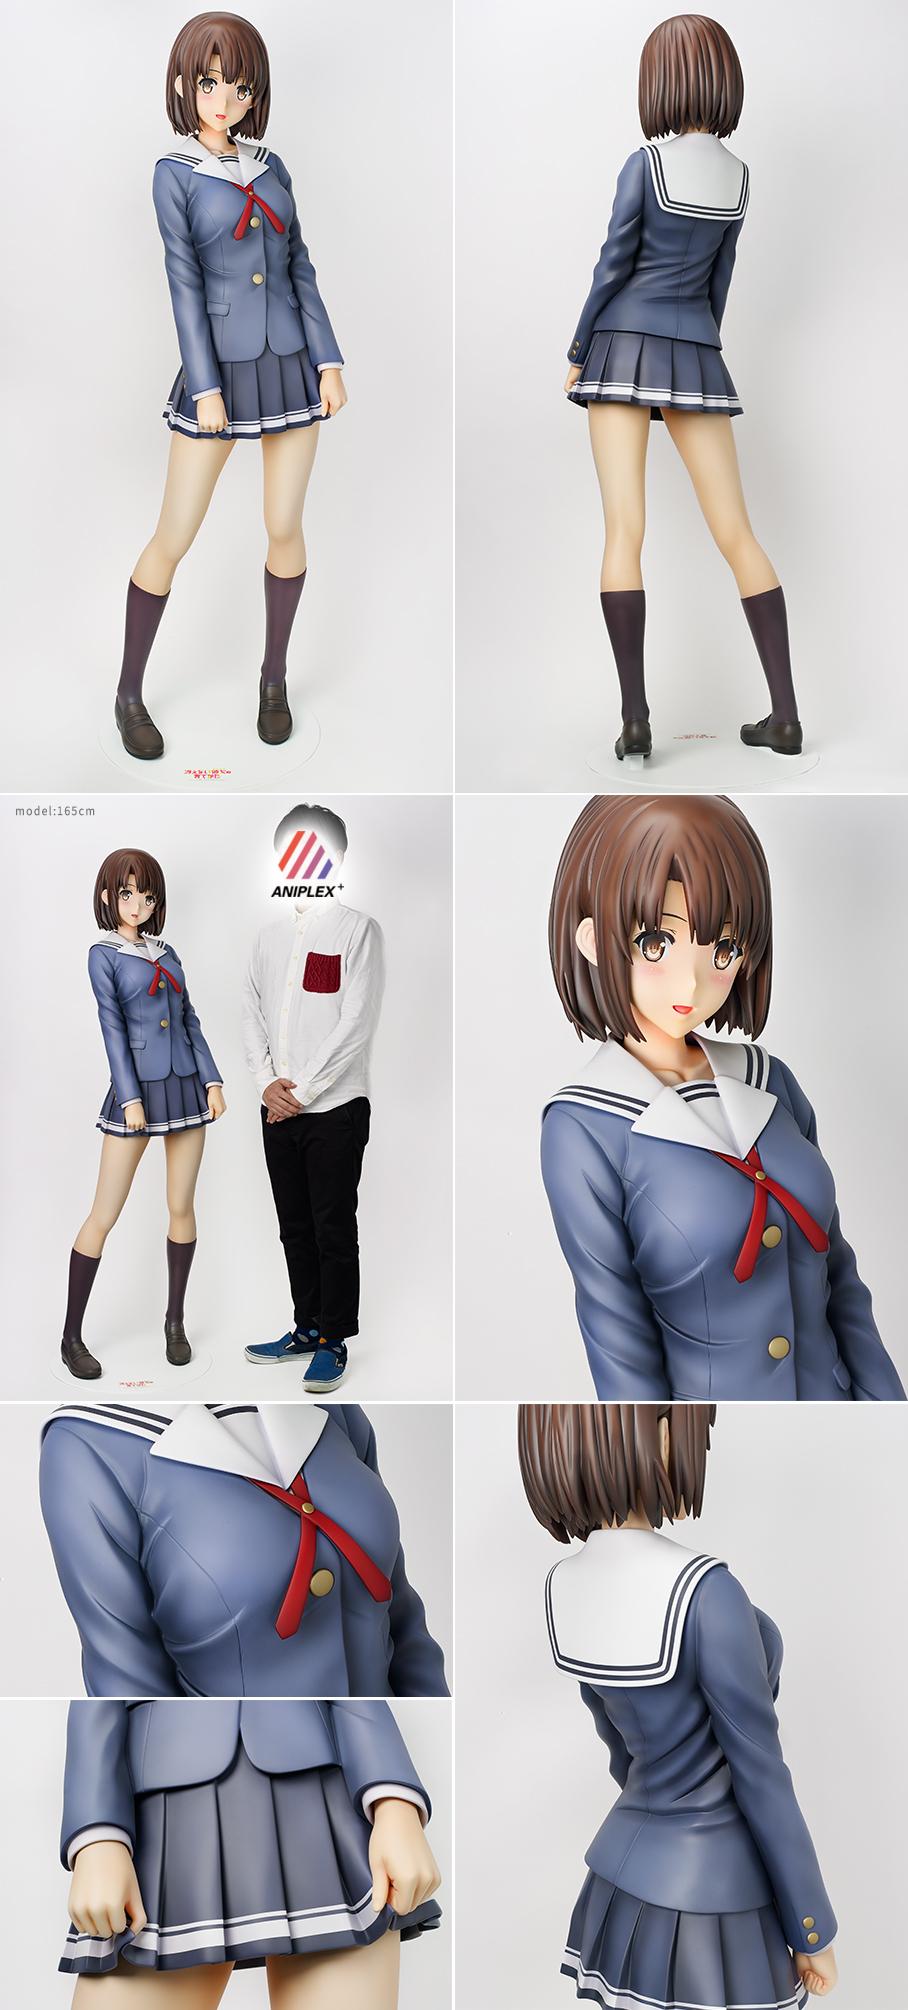 Life-Sized Saekano Megumi Katou Figure 2